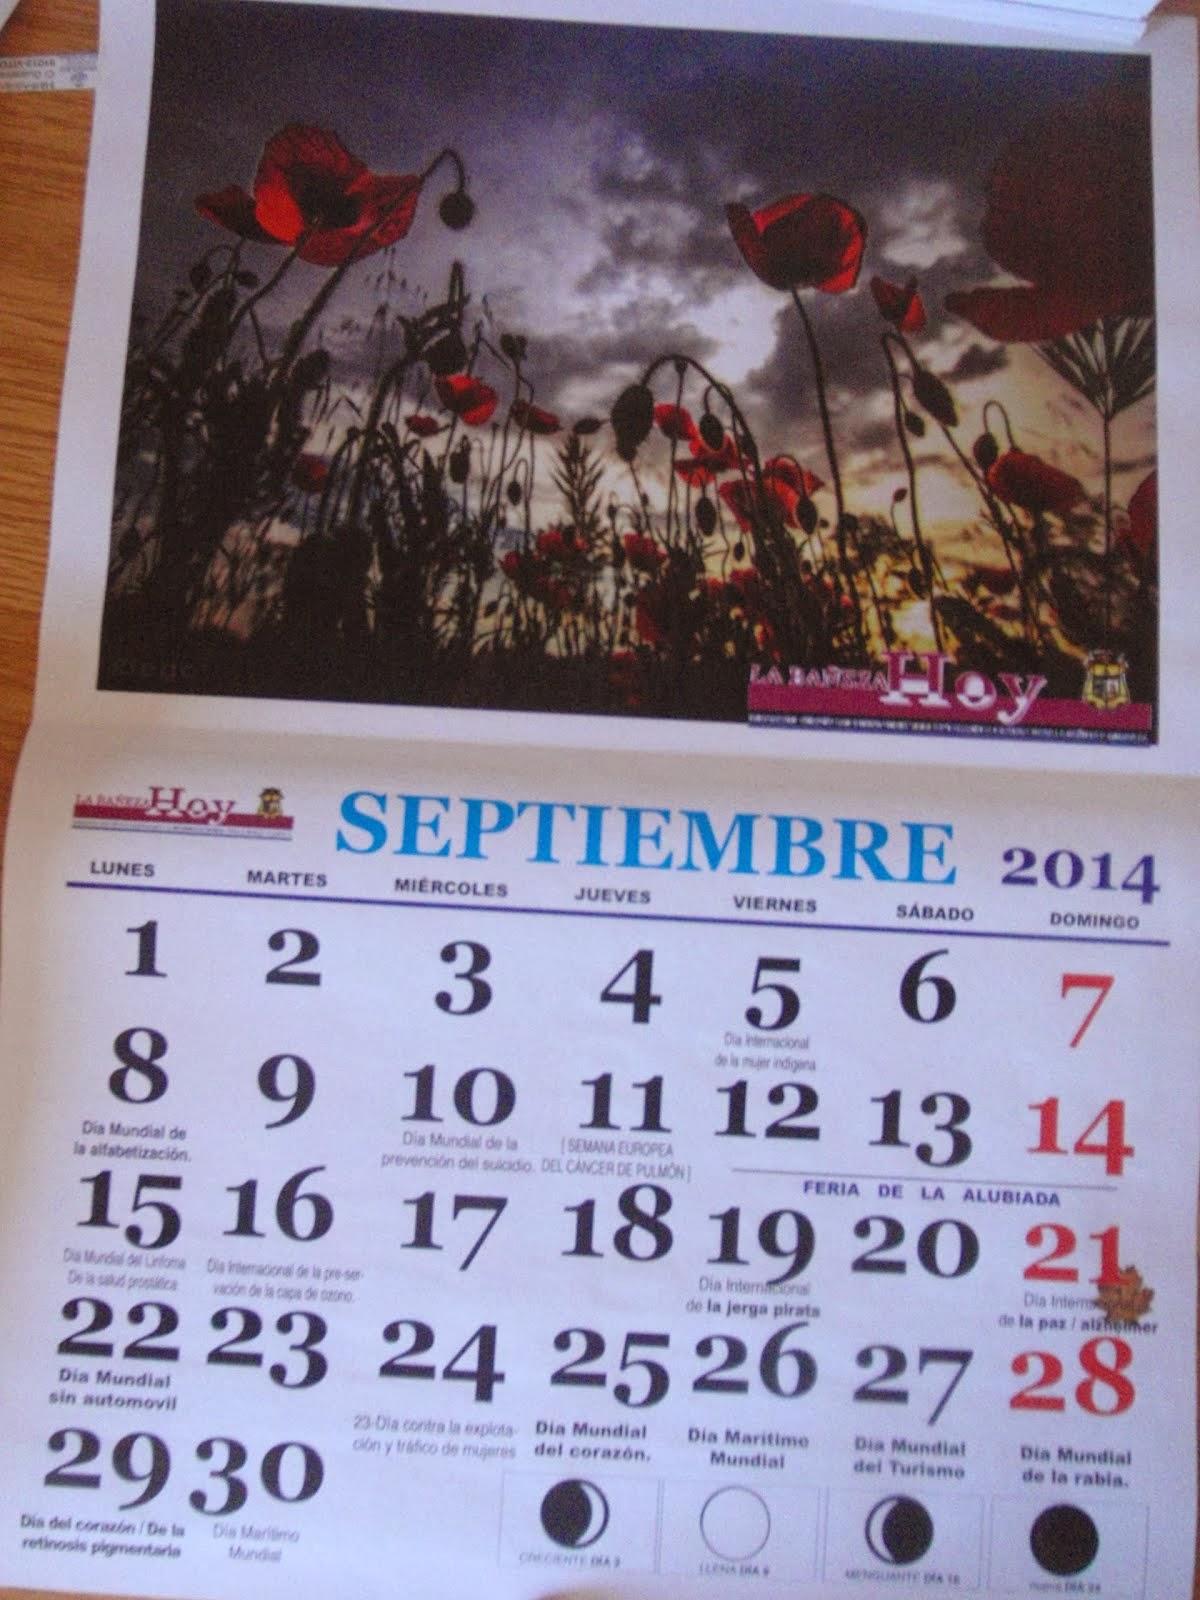 Calendarios de los Días Mundiales 2012, 2013, 2014, 2015   A-GO-TA-DOS